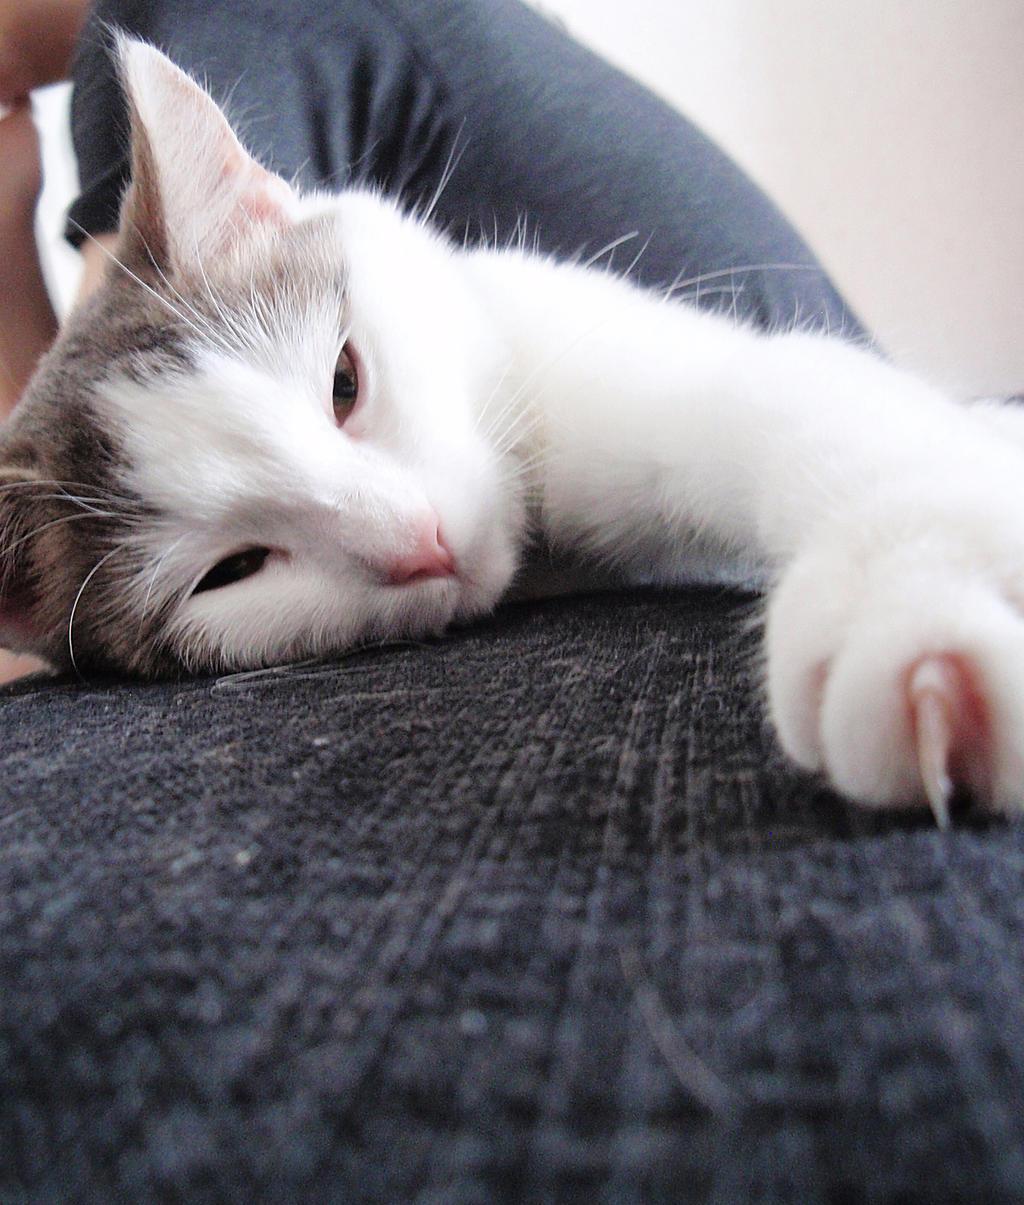 Sleepy cat by kitsune89